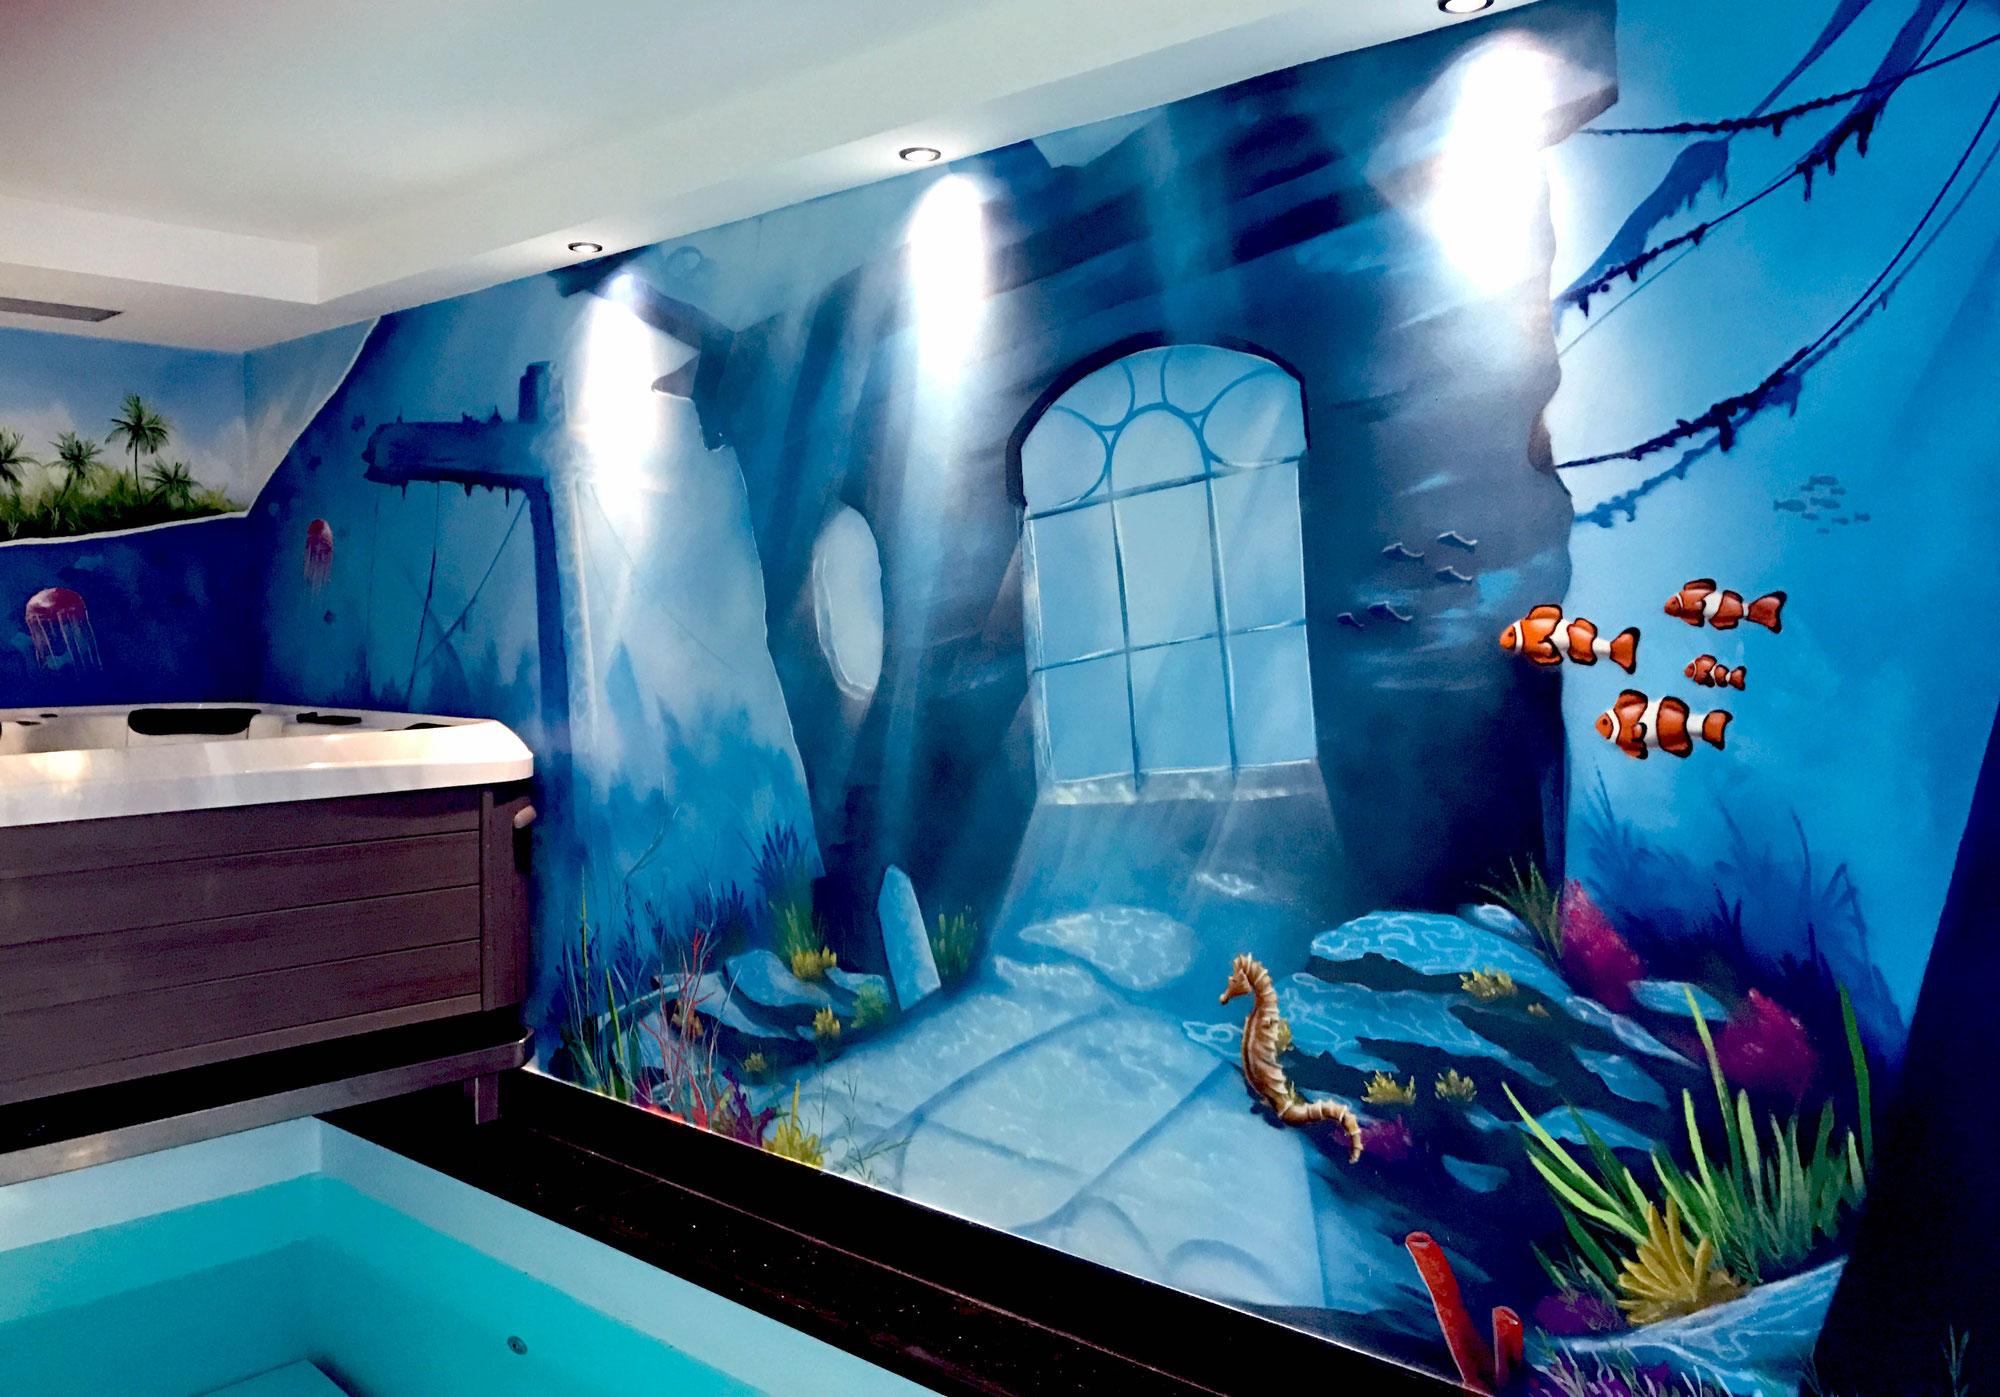 blog news zu graffiti airbrush fassaden wandmalerei illusionskunst appolloart. Black Bedroom Furniture Sets. Home Design Ideas